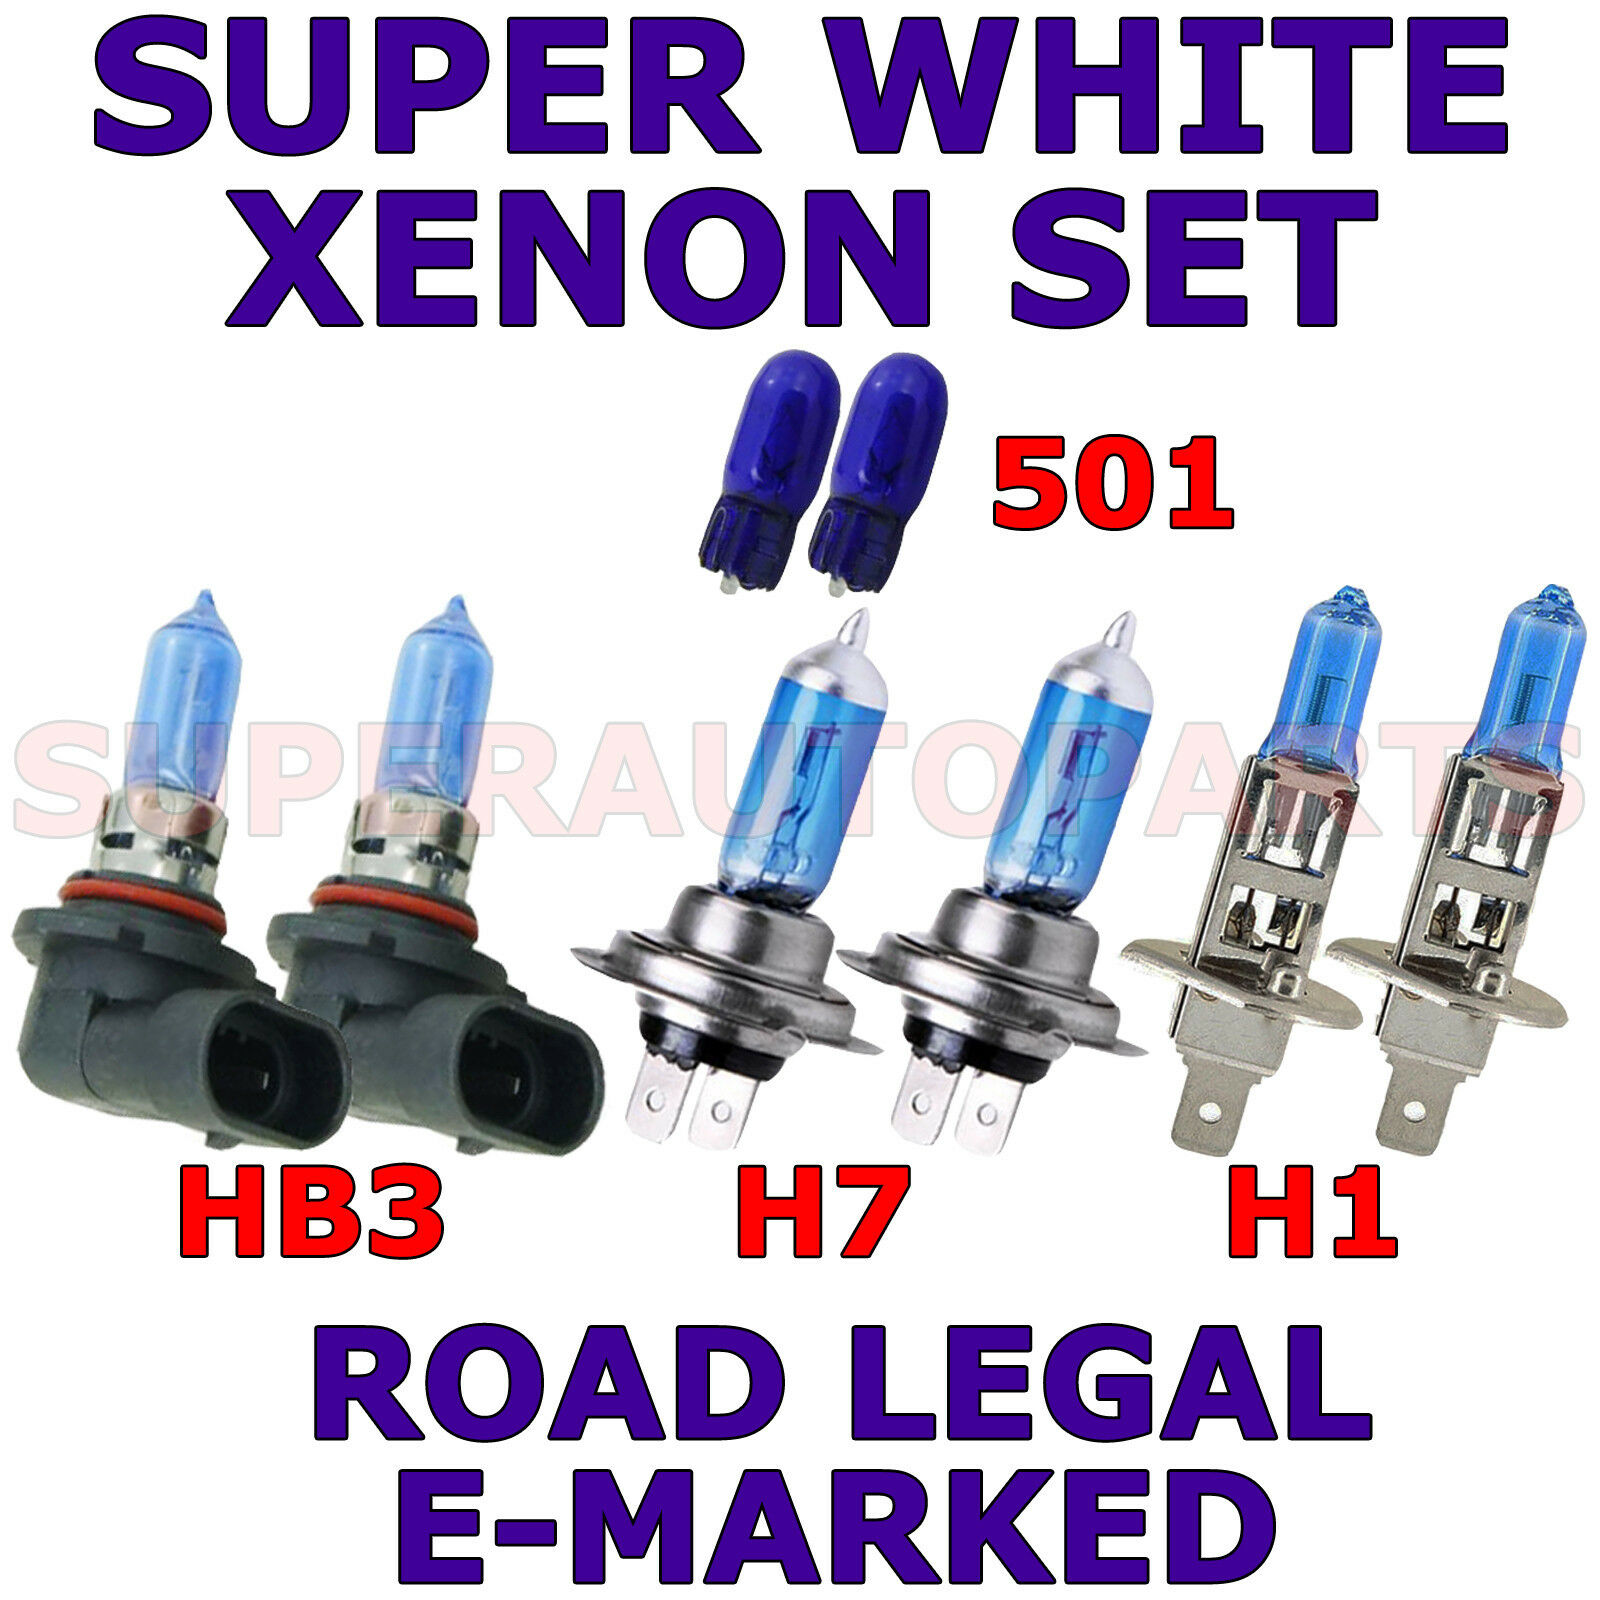 FITS RENAULT CLIO 1998-01 SET OF H1 HB3 H7 501 HALOGEN SUPER WHITE LIGHT BULBS